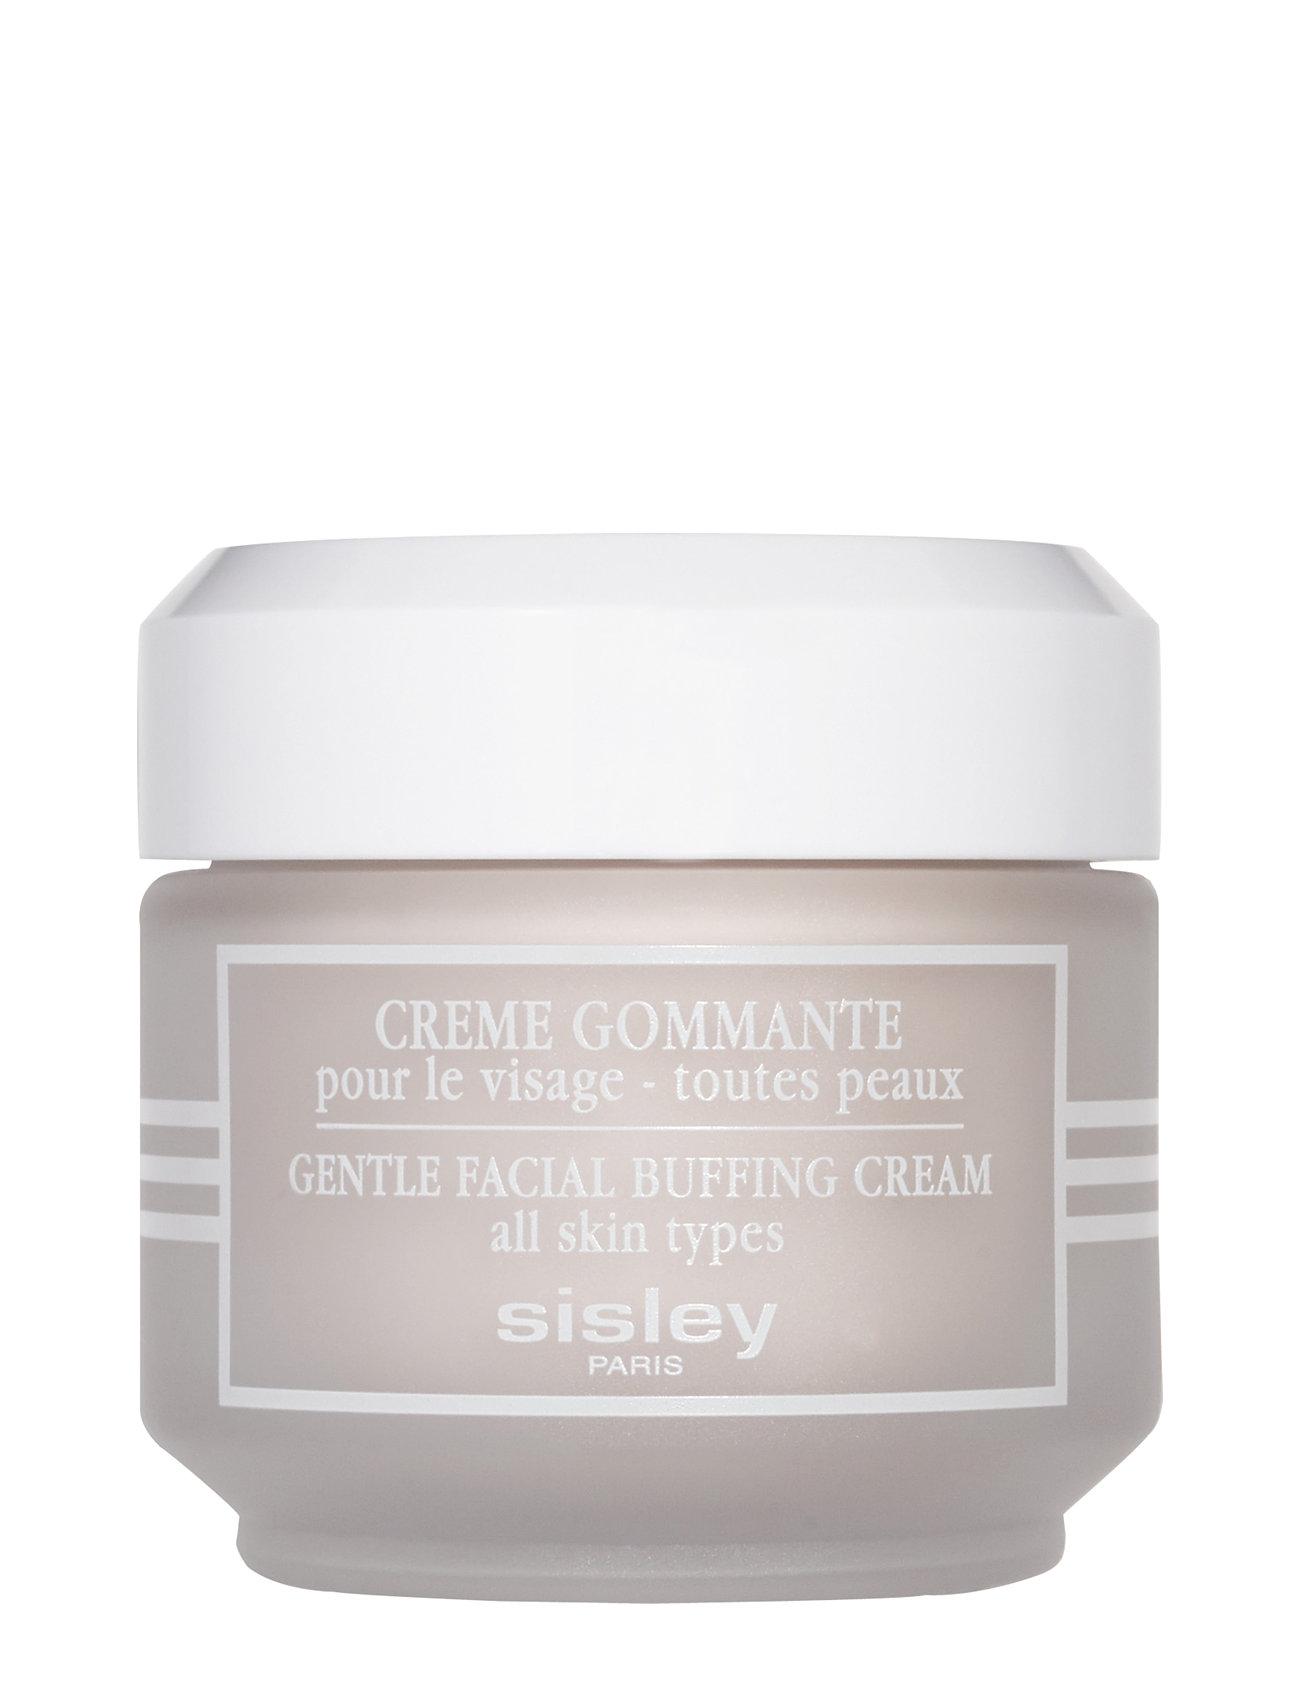 Sisley FACIAL BUFFING CREAM 50ml JAR - CLEAR